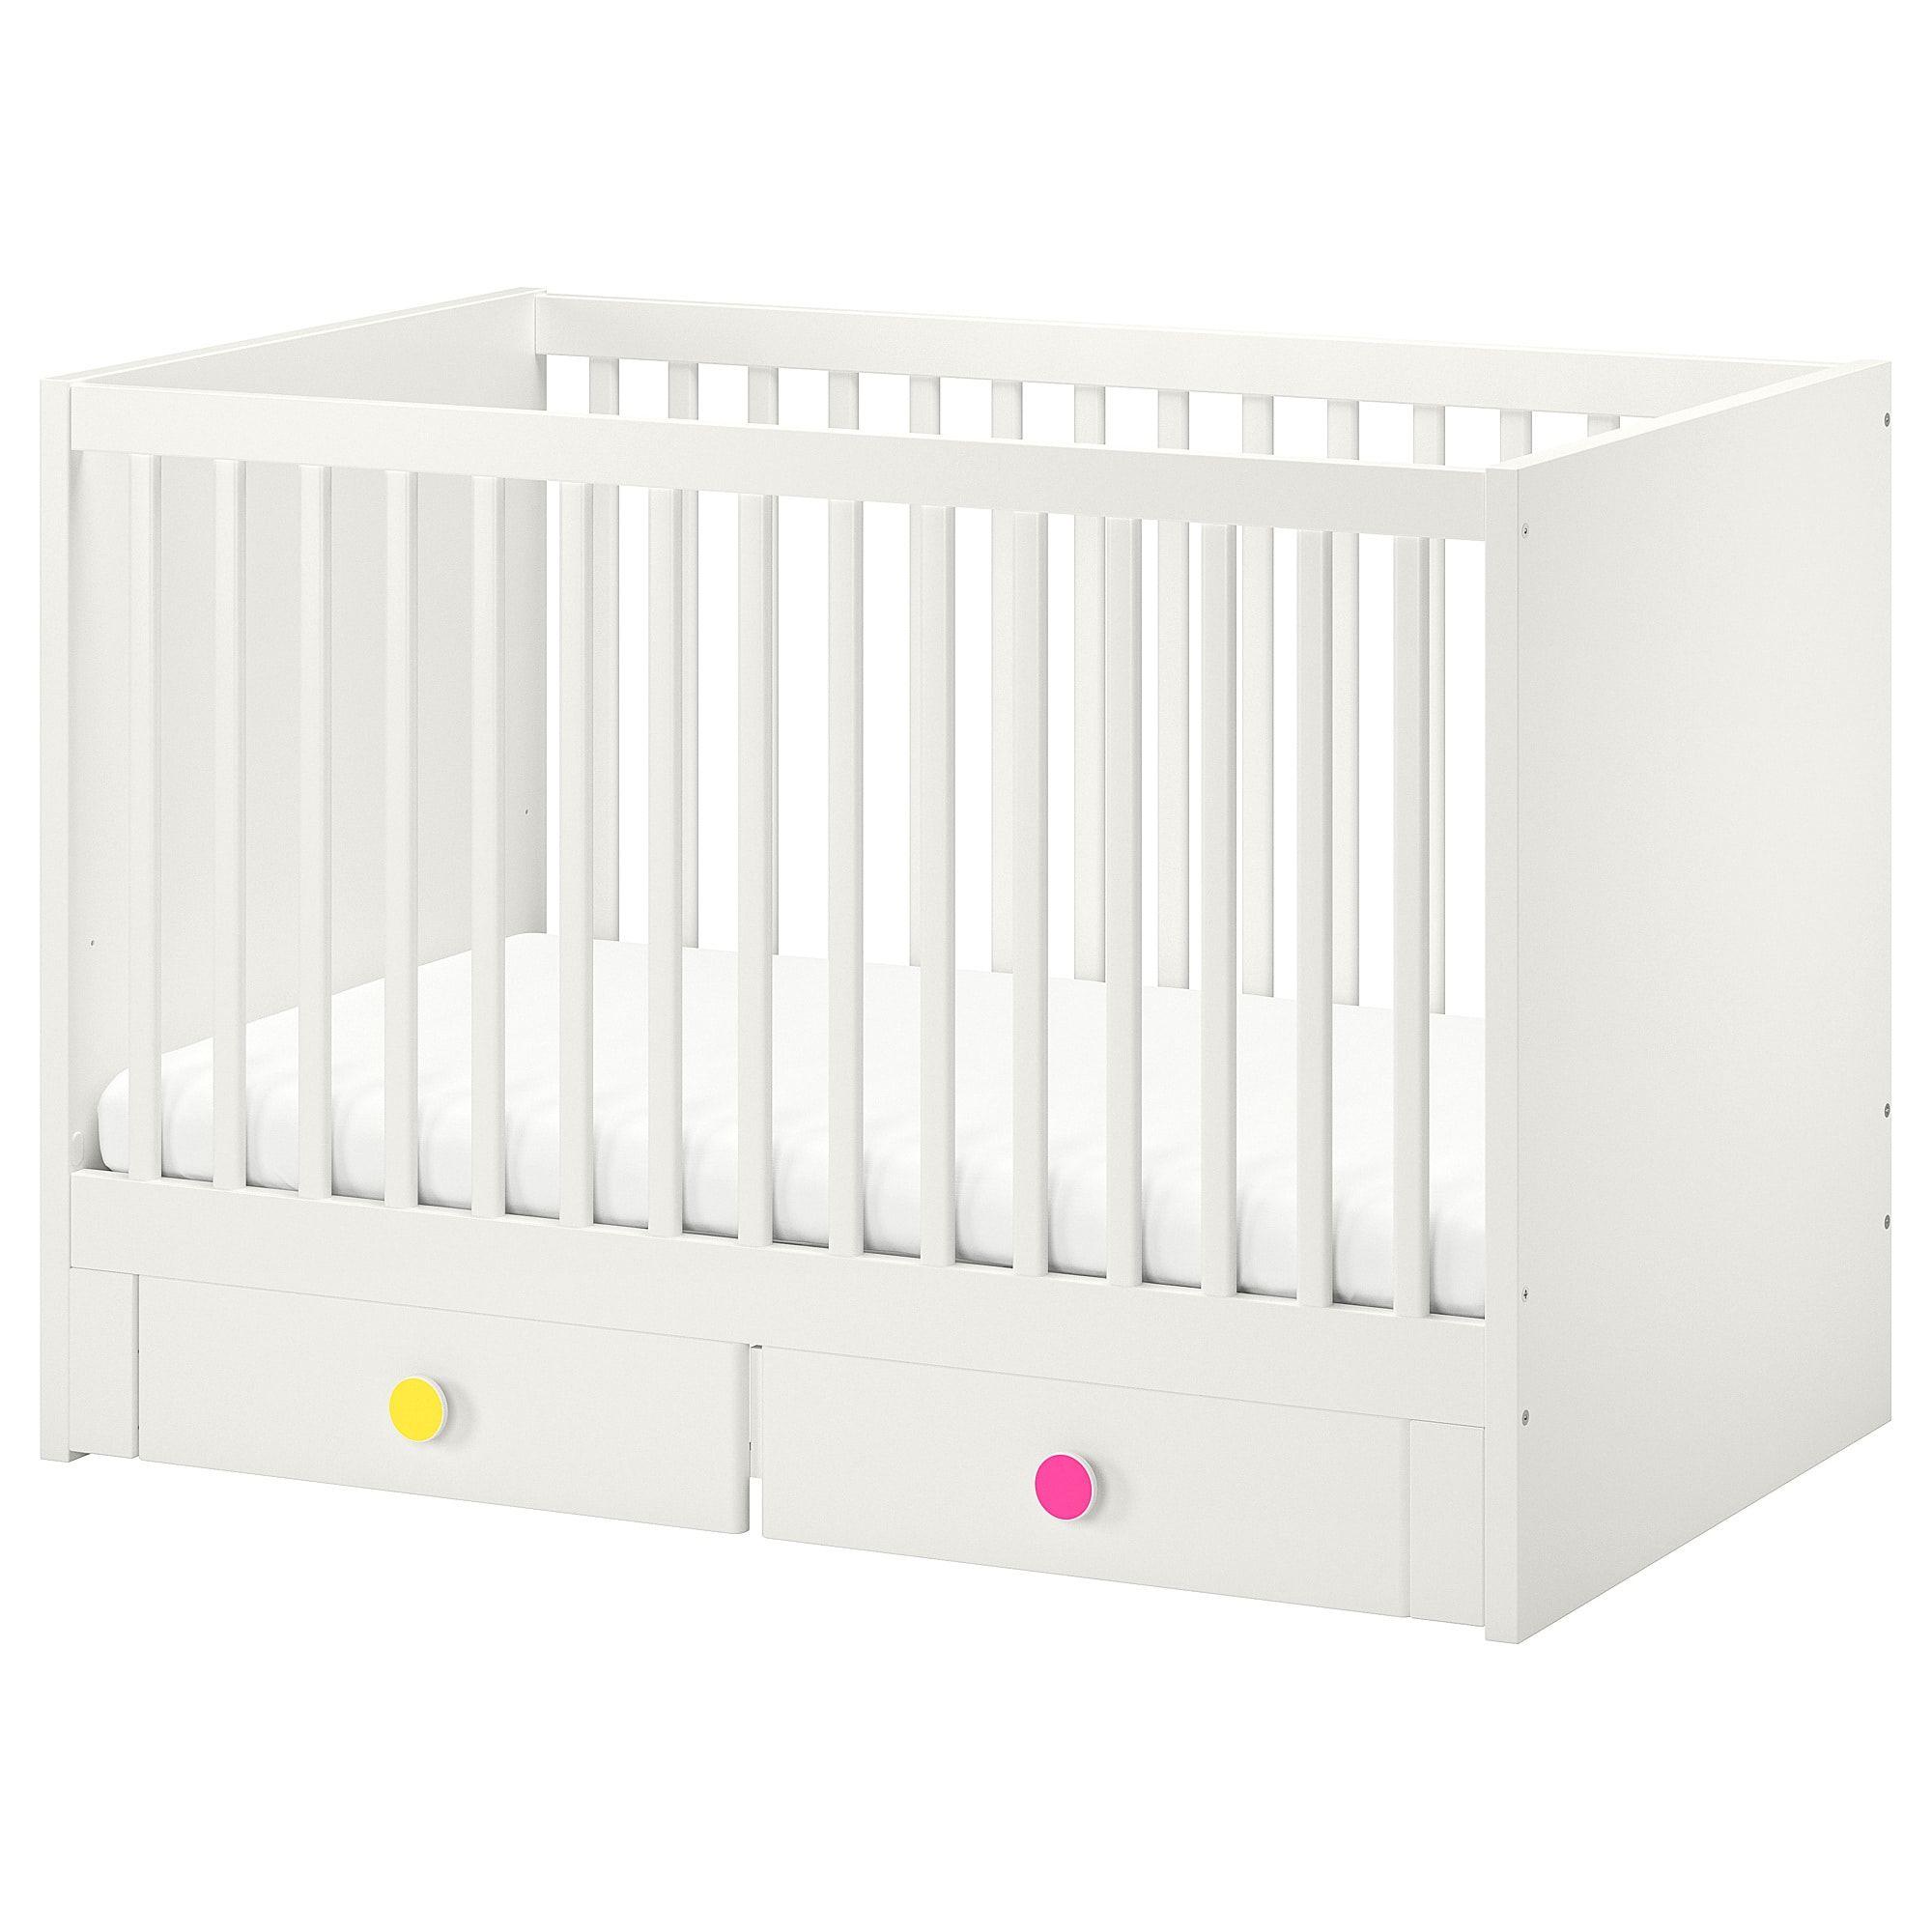 Stuva Folja Crib With Drawers White 27 1 2x52 Ikea Stuva Cribs Ikea Crib